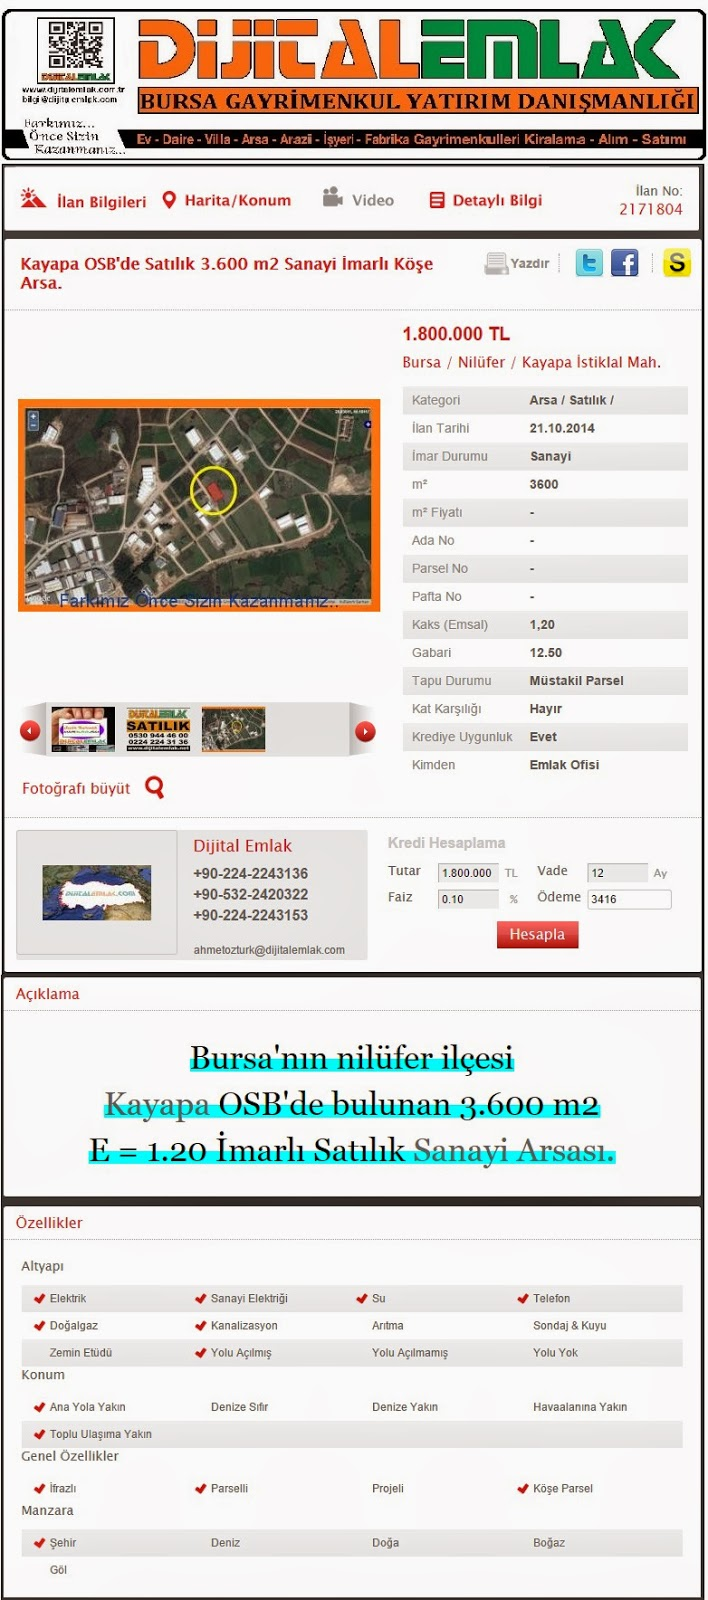 http://www.dijitalemlak.com.tr/ilan/2171804_kayapa-osbde-satilik-3600-m2-sanayi-imarli-kose-arsa.html